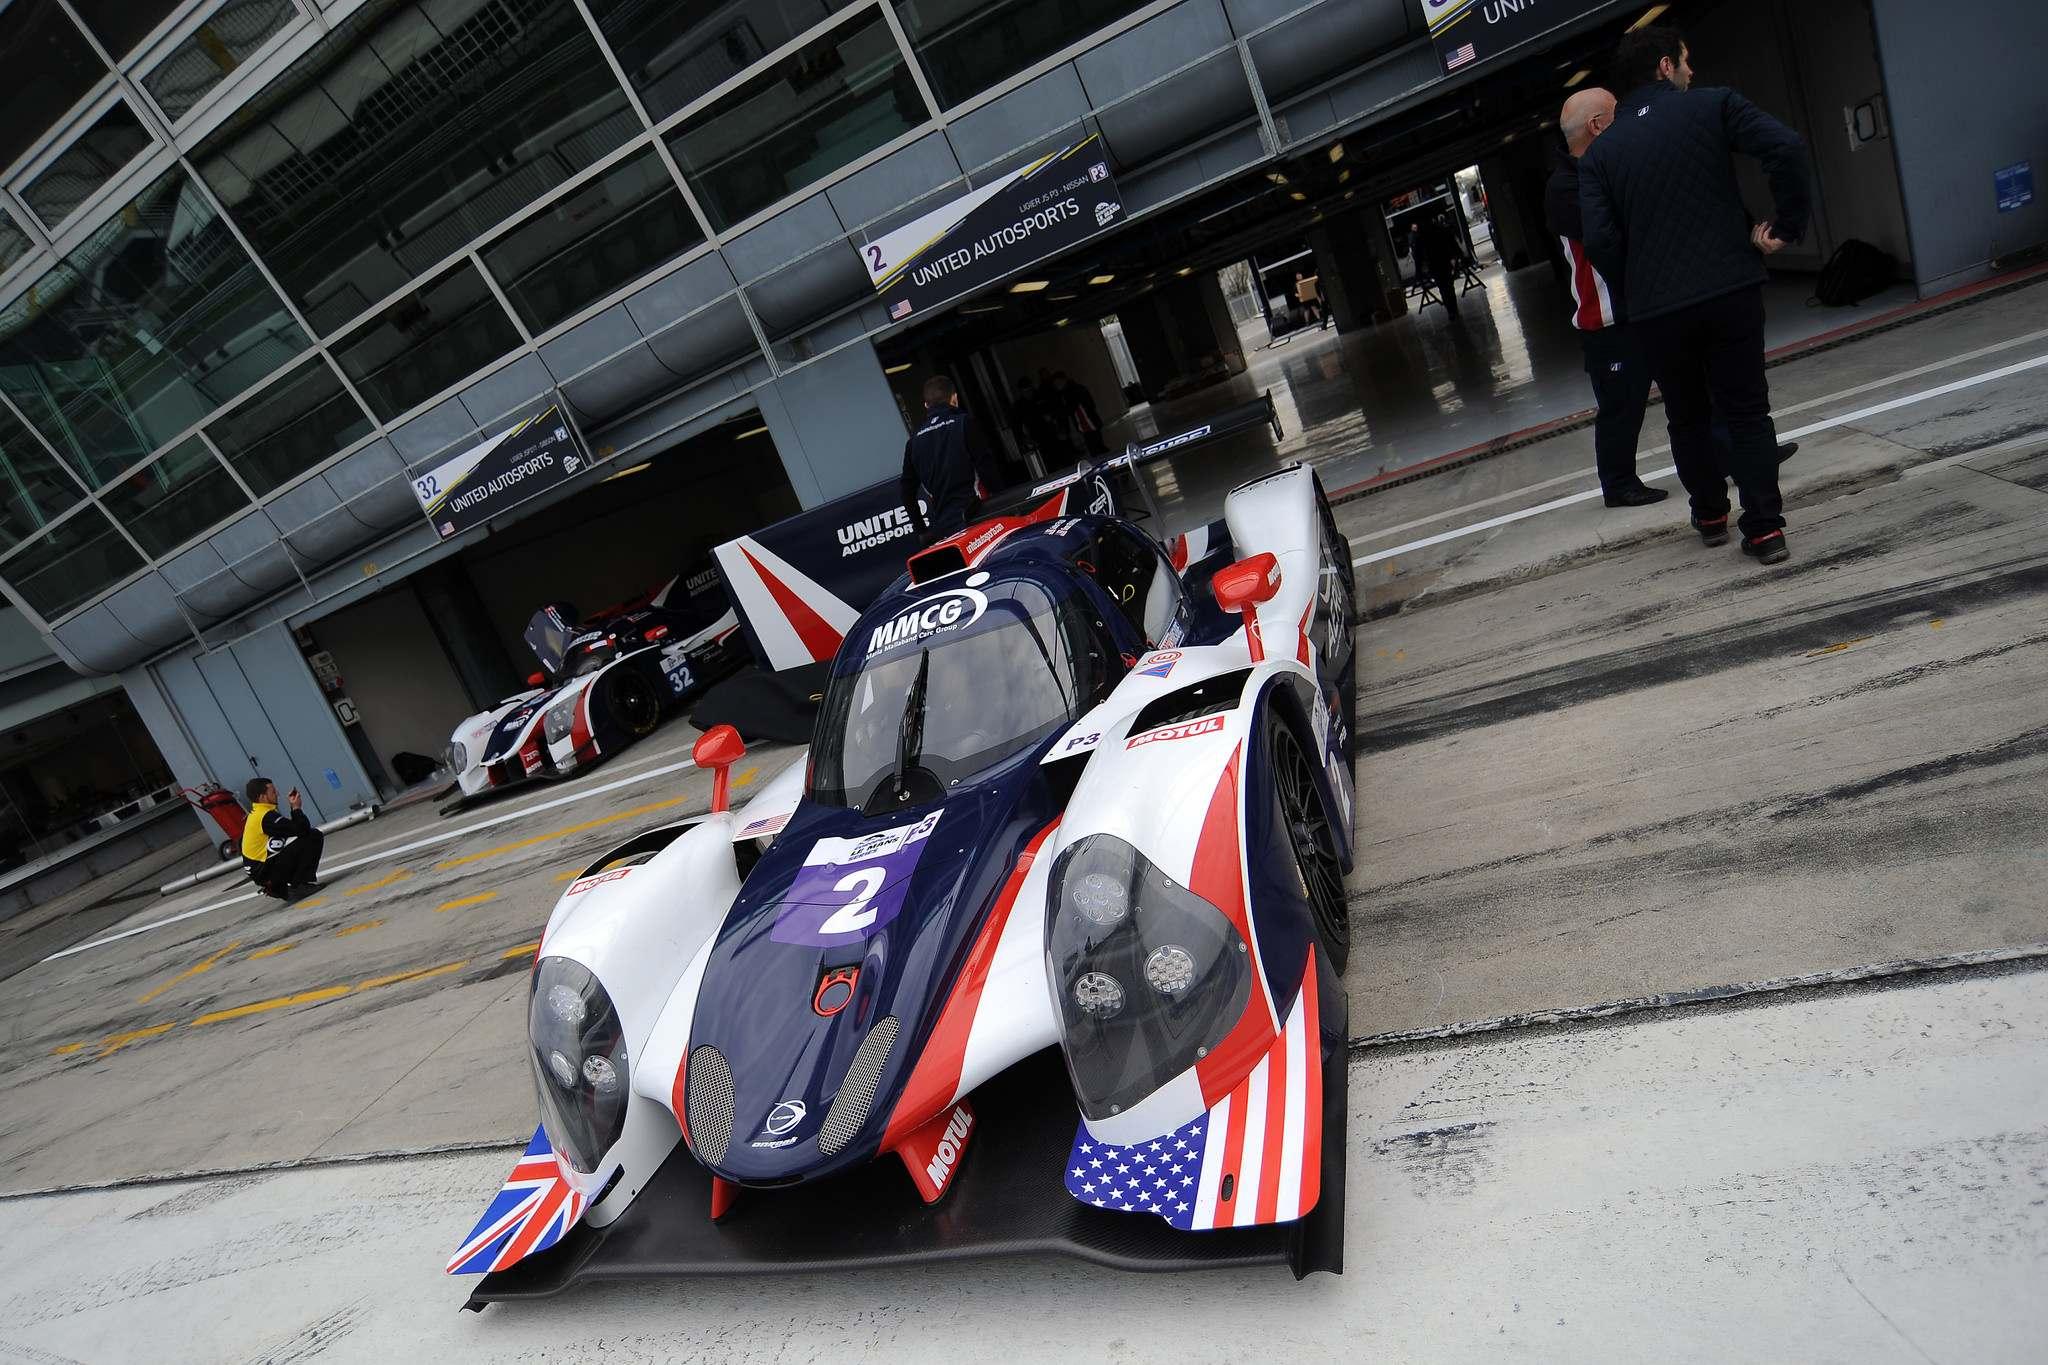 unitedautosports10 United Autosports in Monza